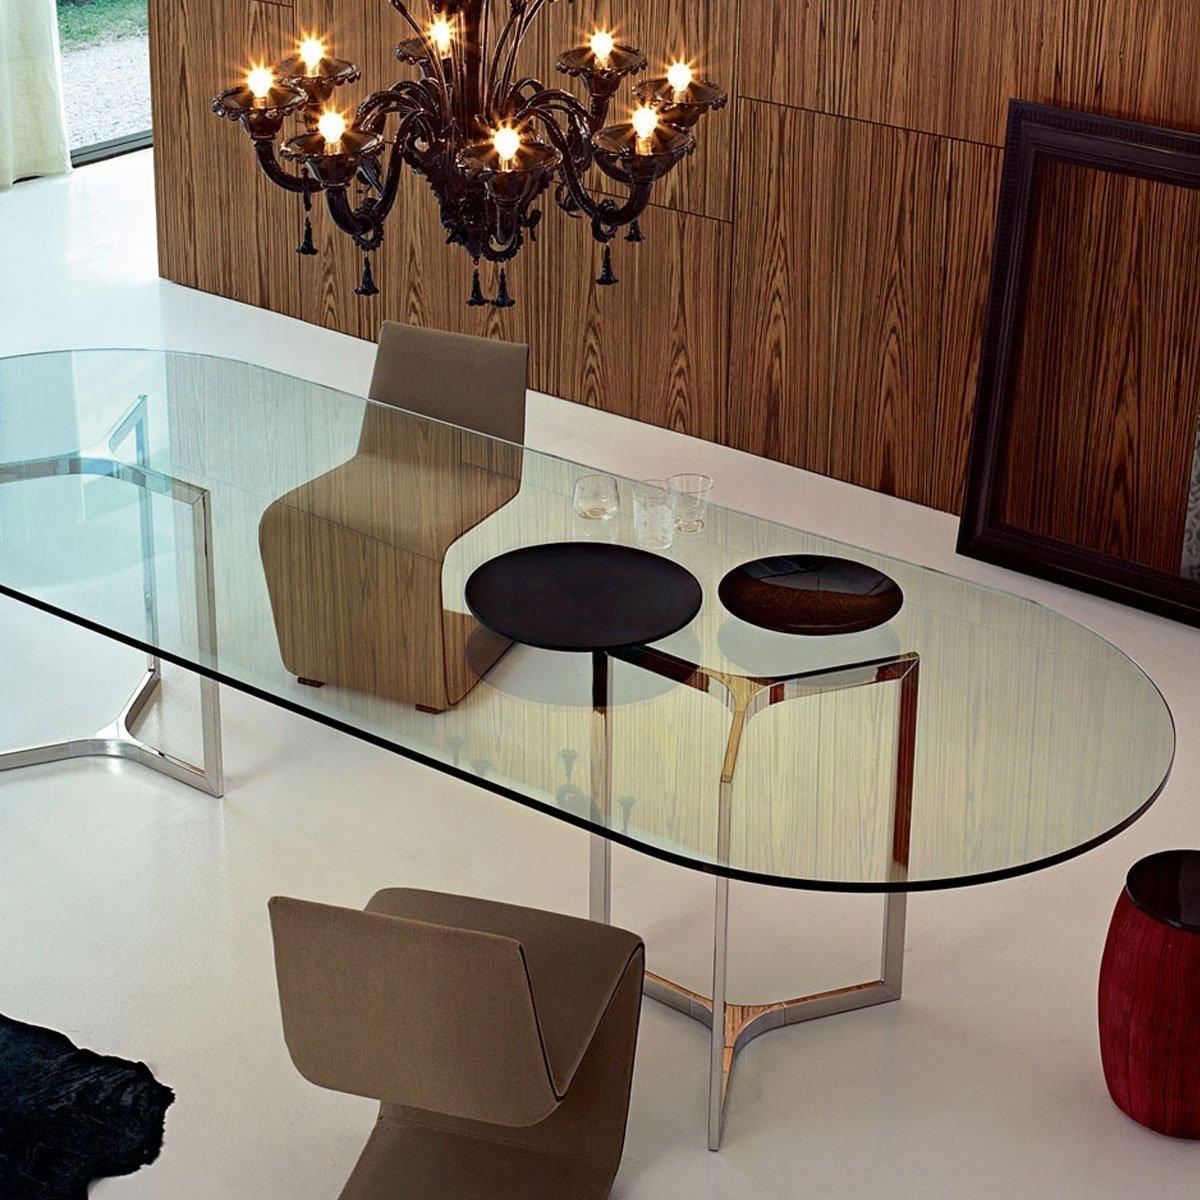 Raj Glass And Metal Table By Gallotti Radice Klarity Glass Furniture